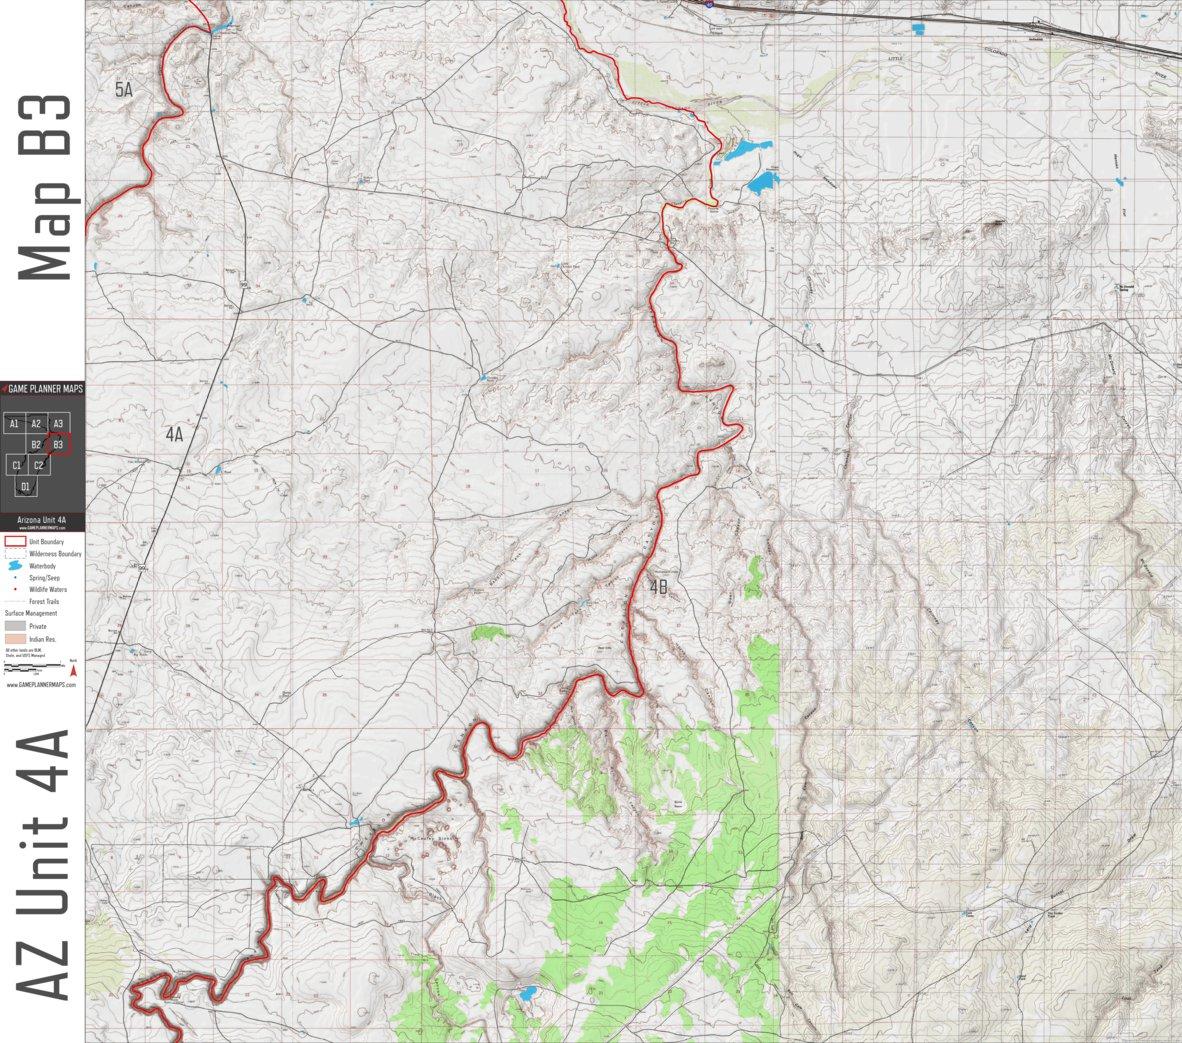 Map Of Unit 4a Arizona.Arizona Unit 4a Game Planner Maps Avenza Maps